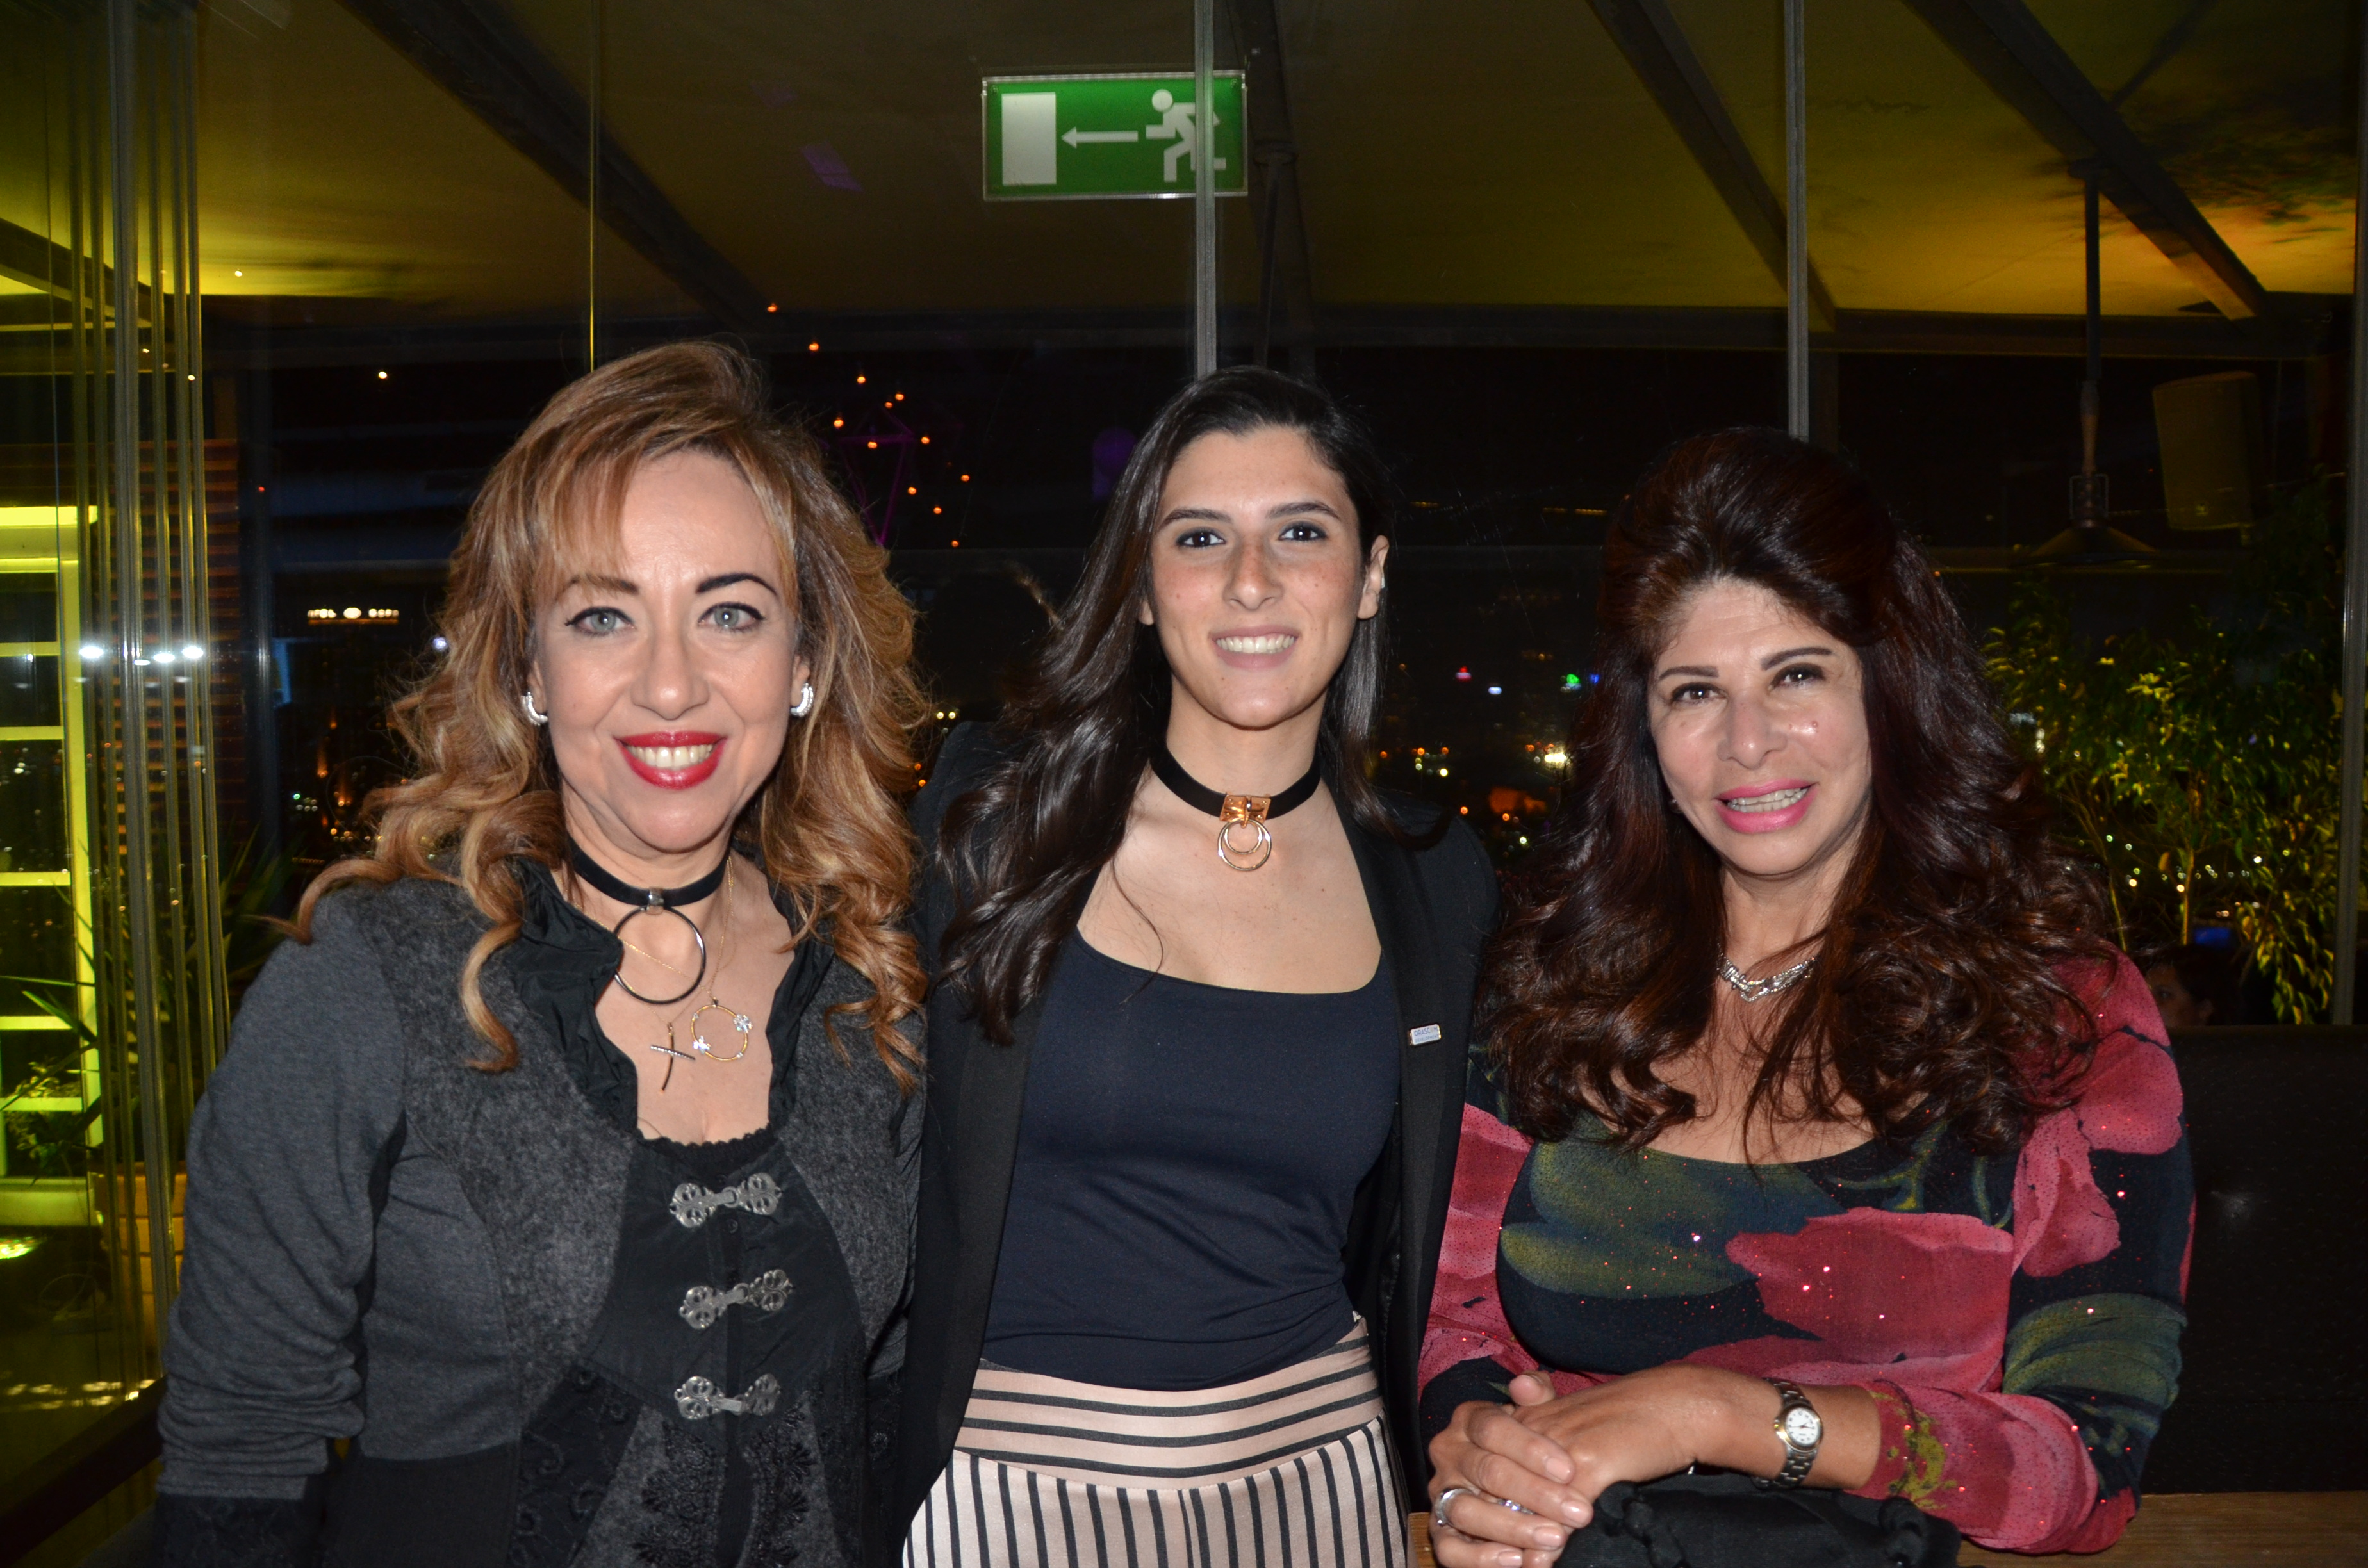 Ms. Dina Nashed, Ms. Yousra Abdel Wahab & Ms. Laila Aggag